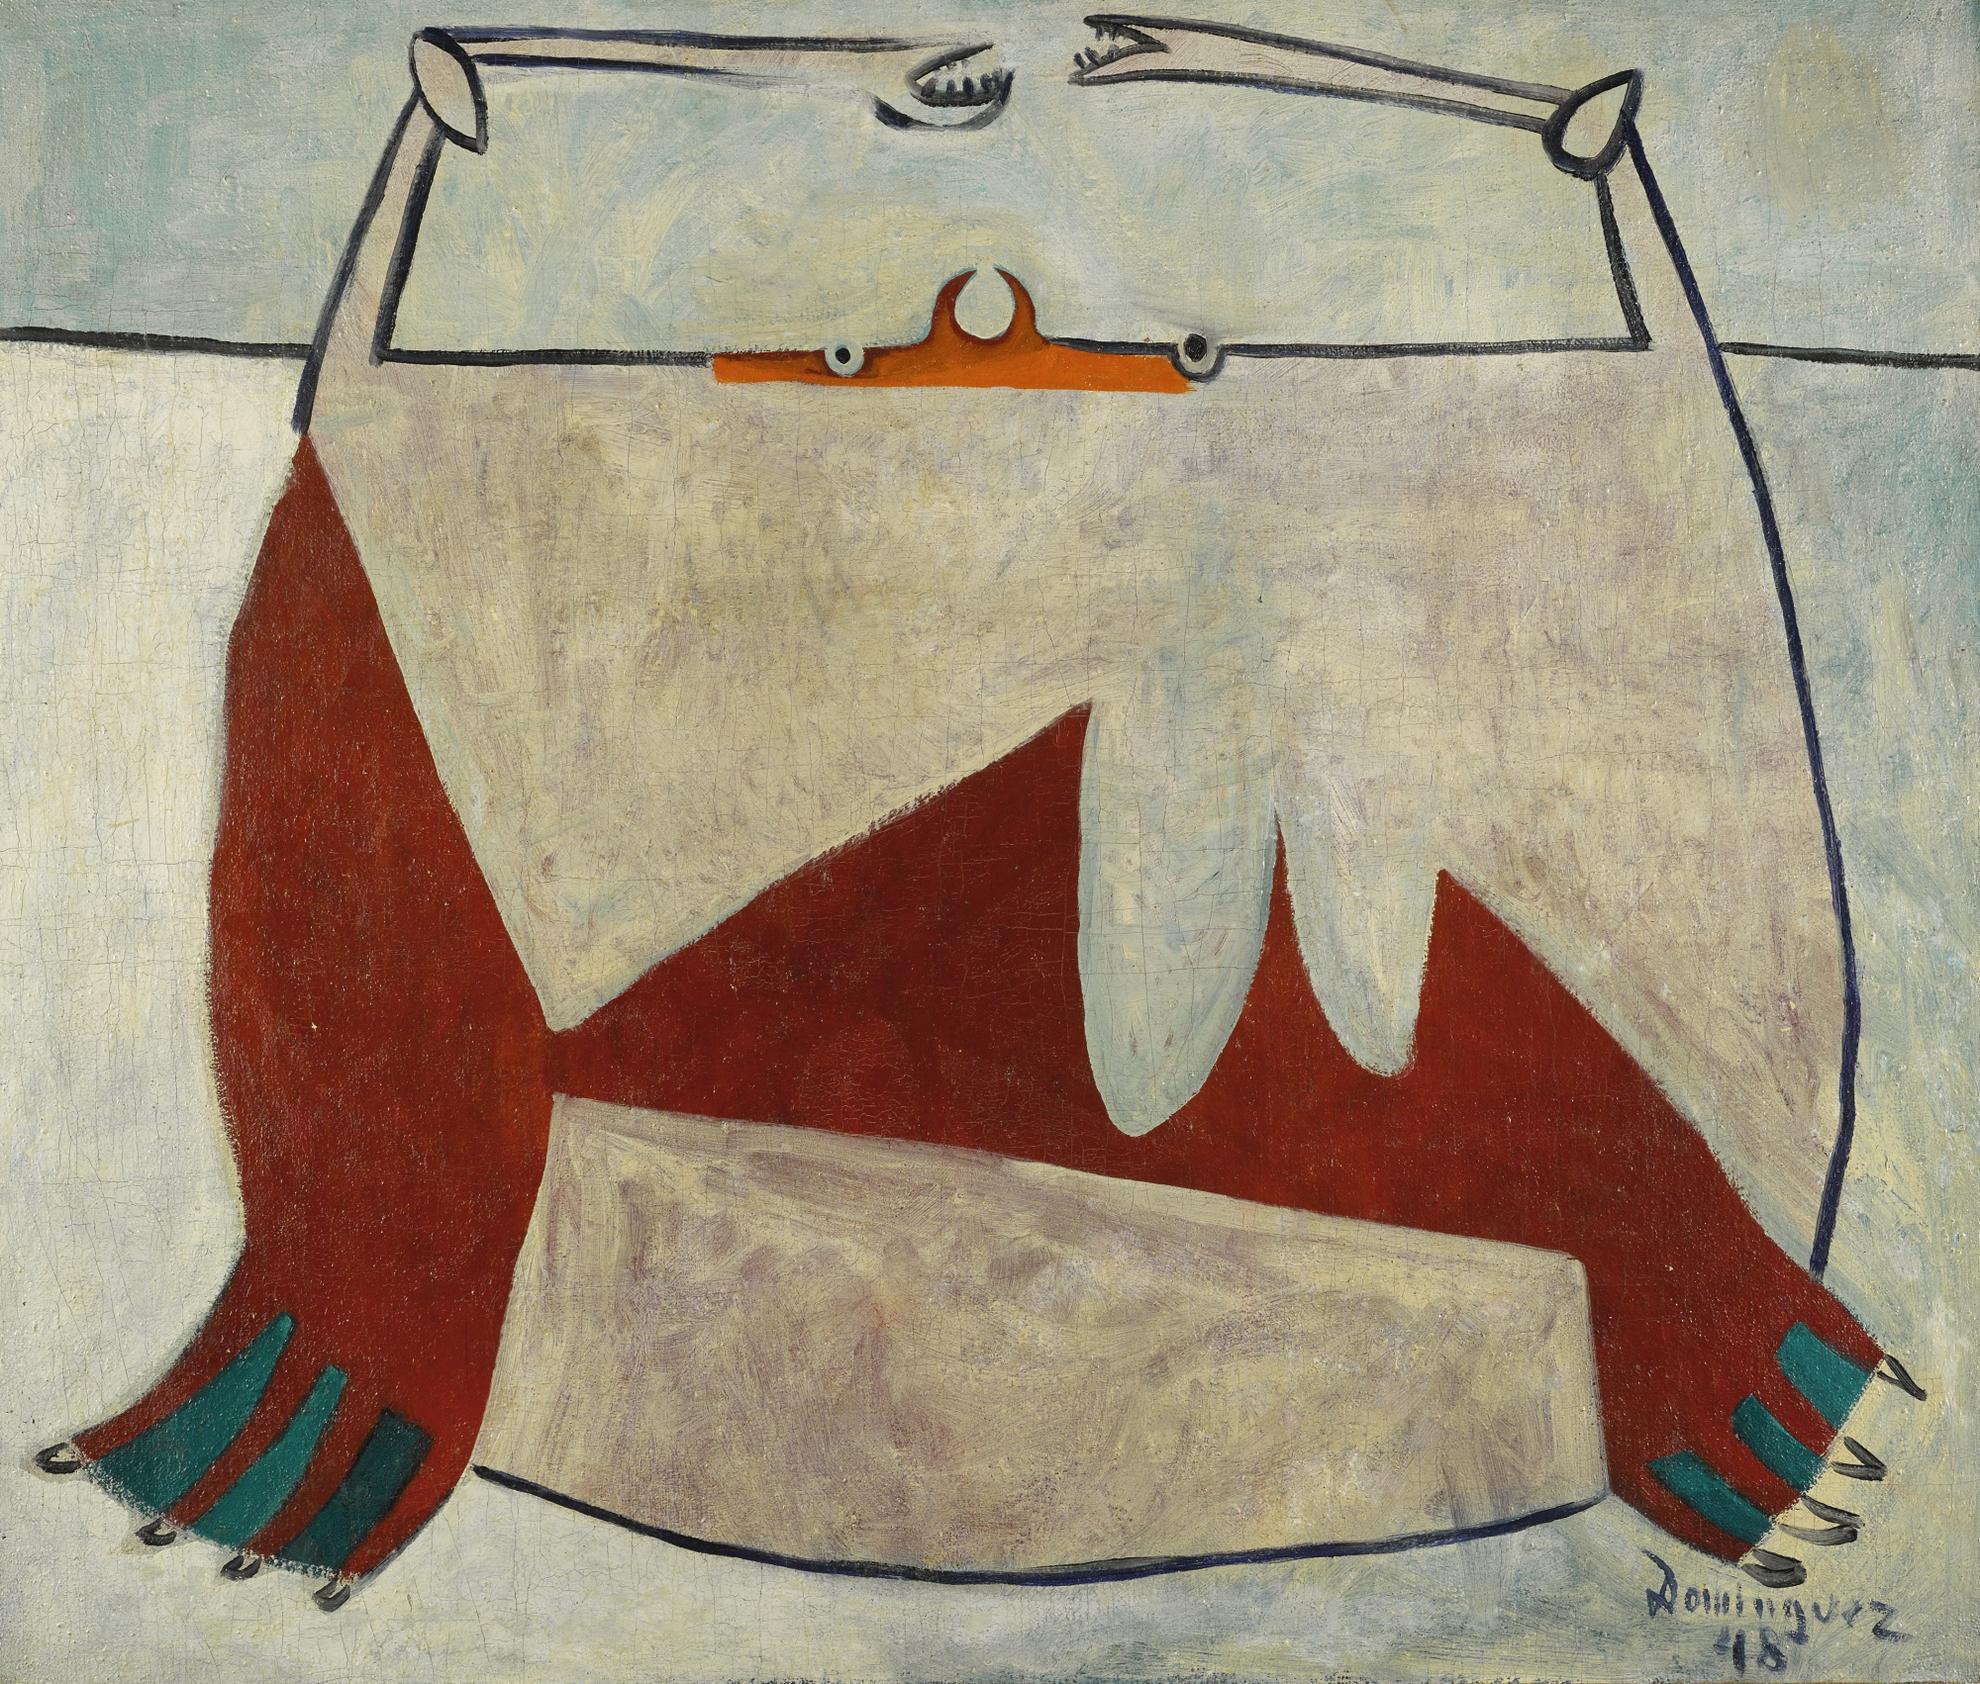 Oscar Dominguez-Autorretrato (Self-Portrait)-1948